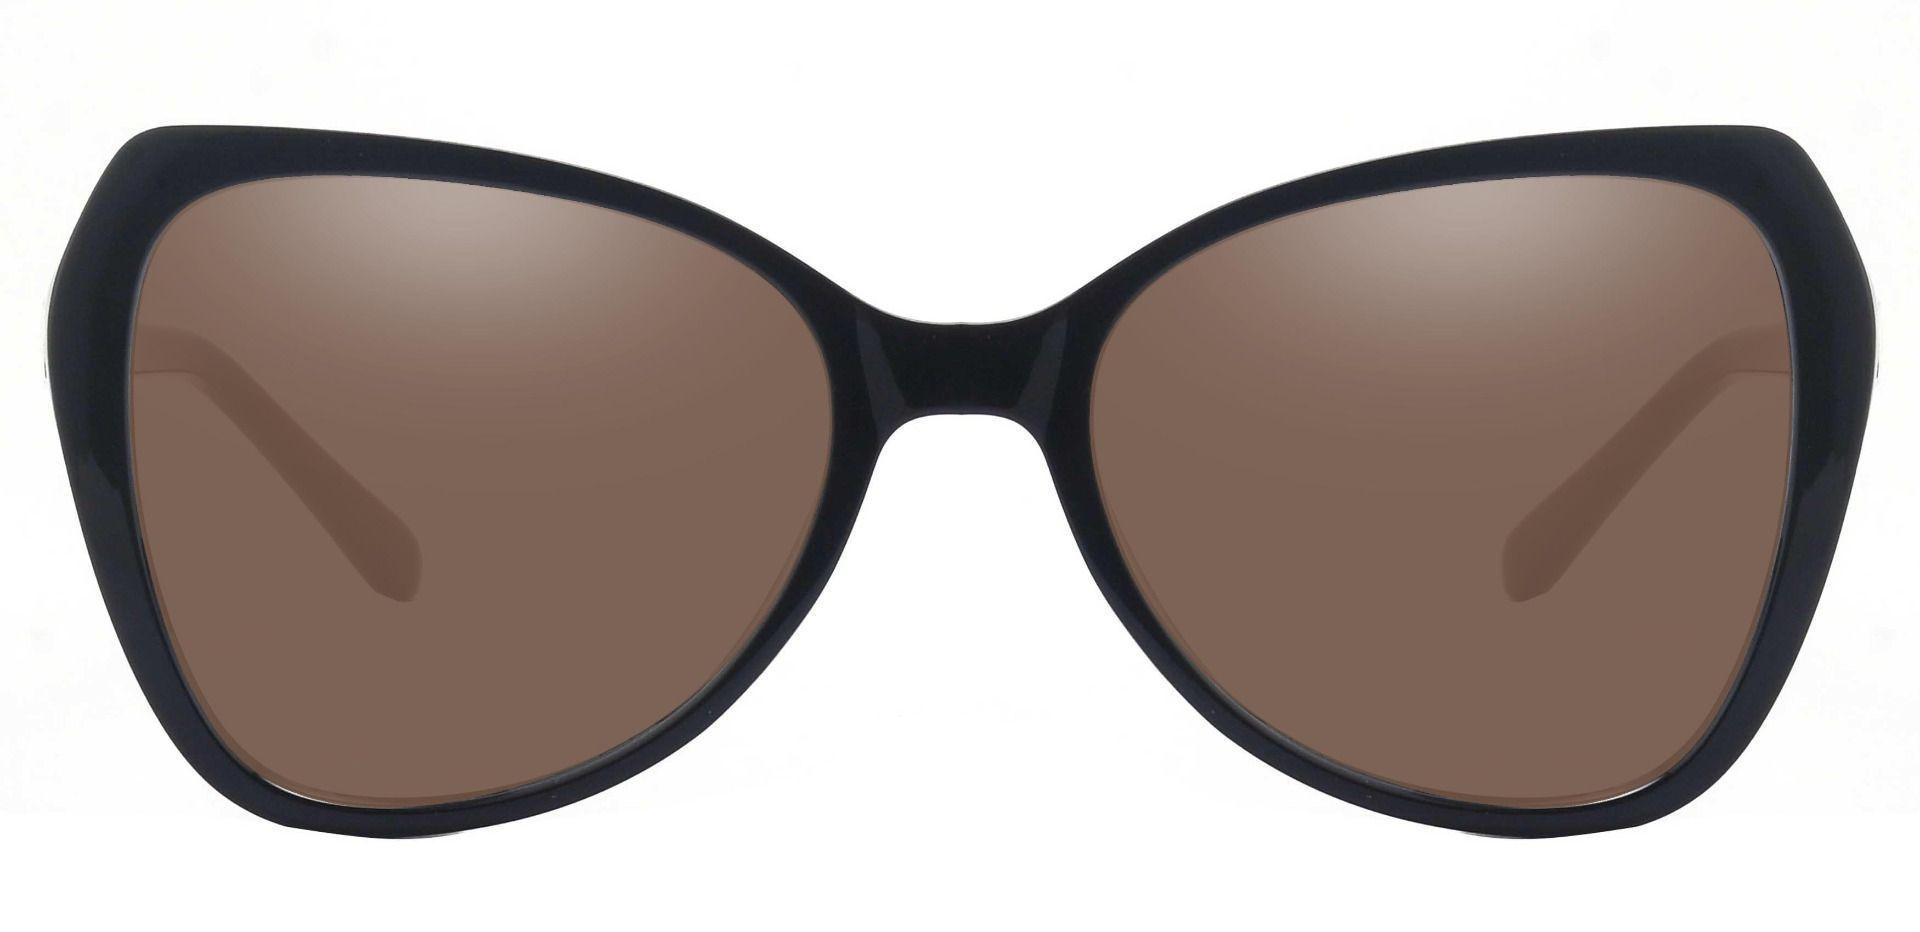 Kayla Geometric Reading Sunglasses - Black Frame With Brown Lenses